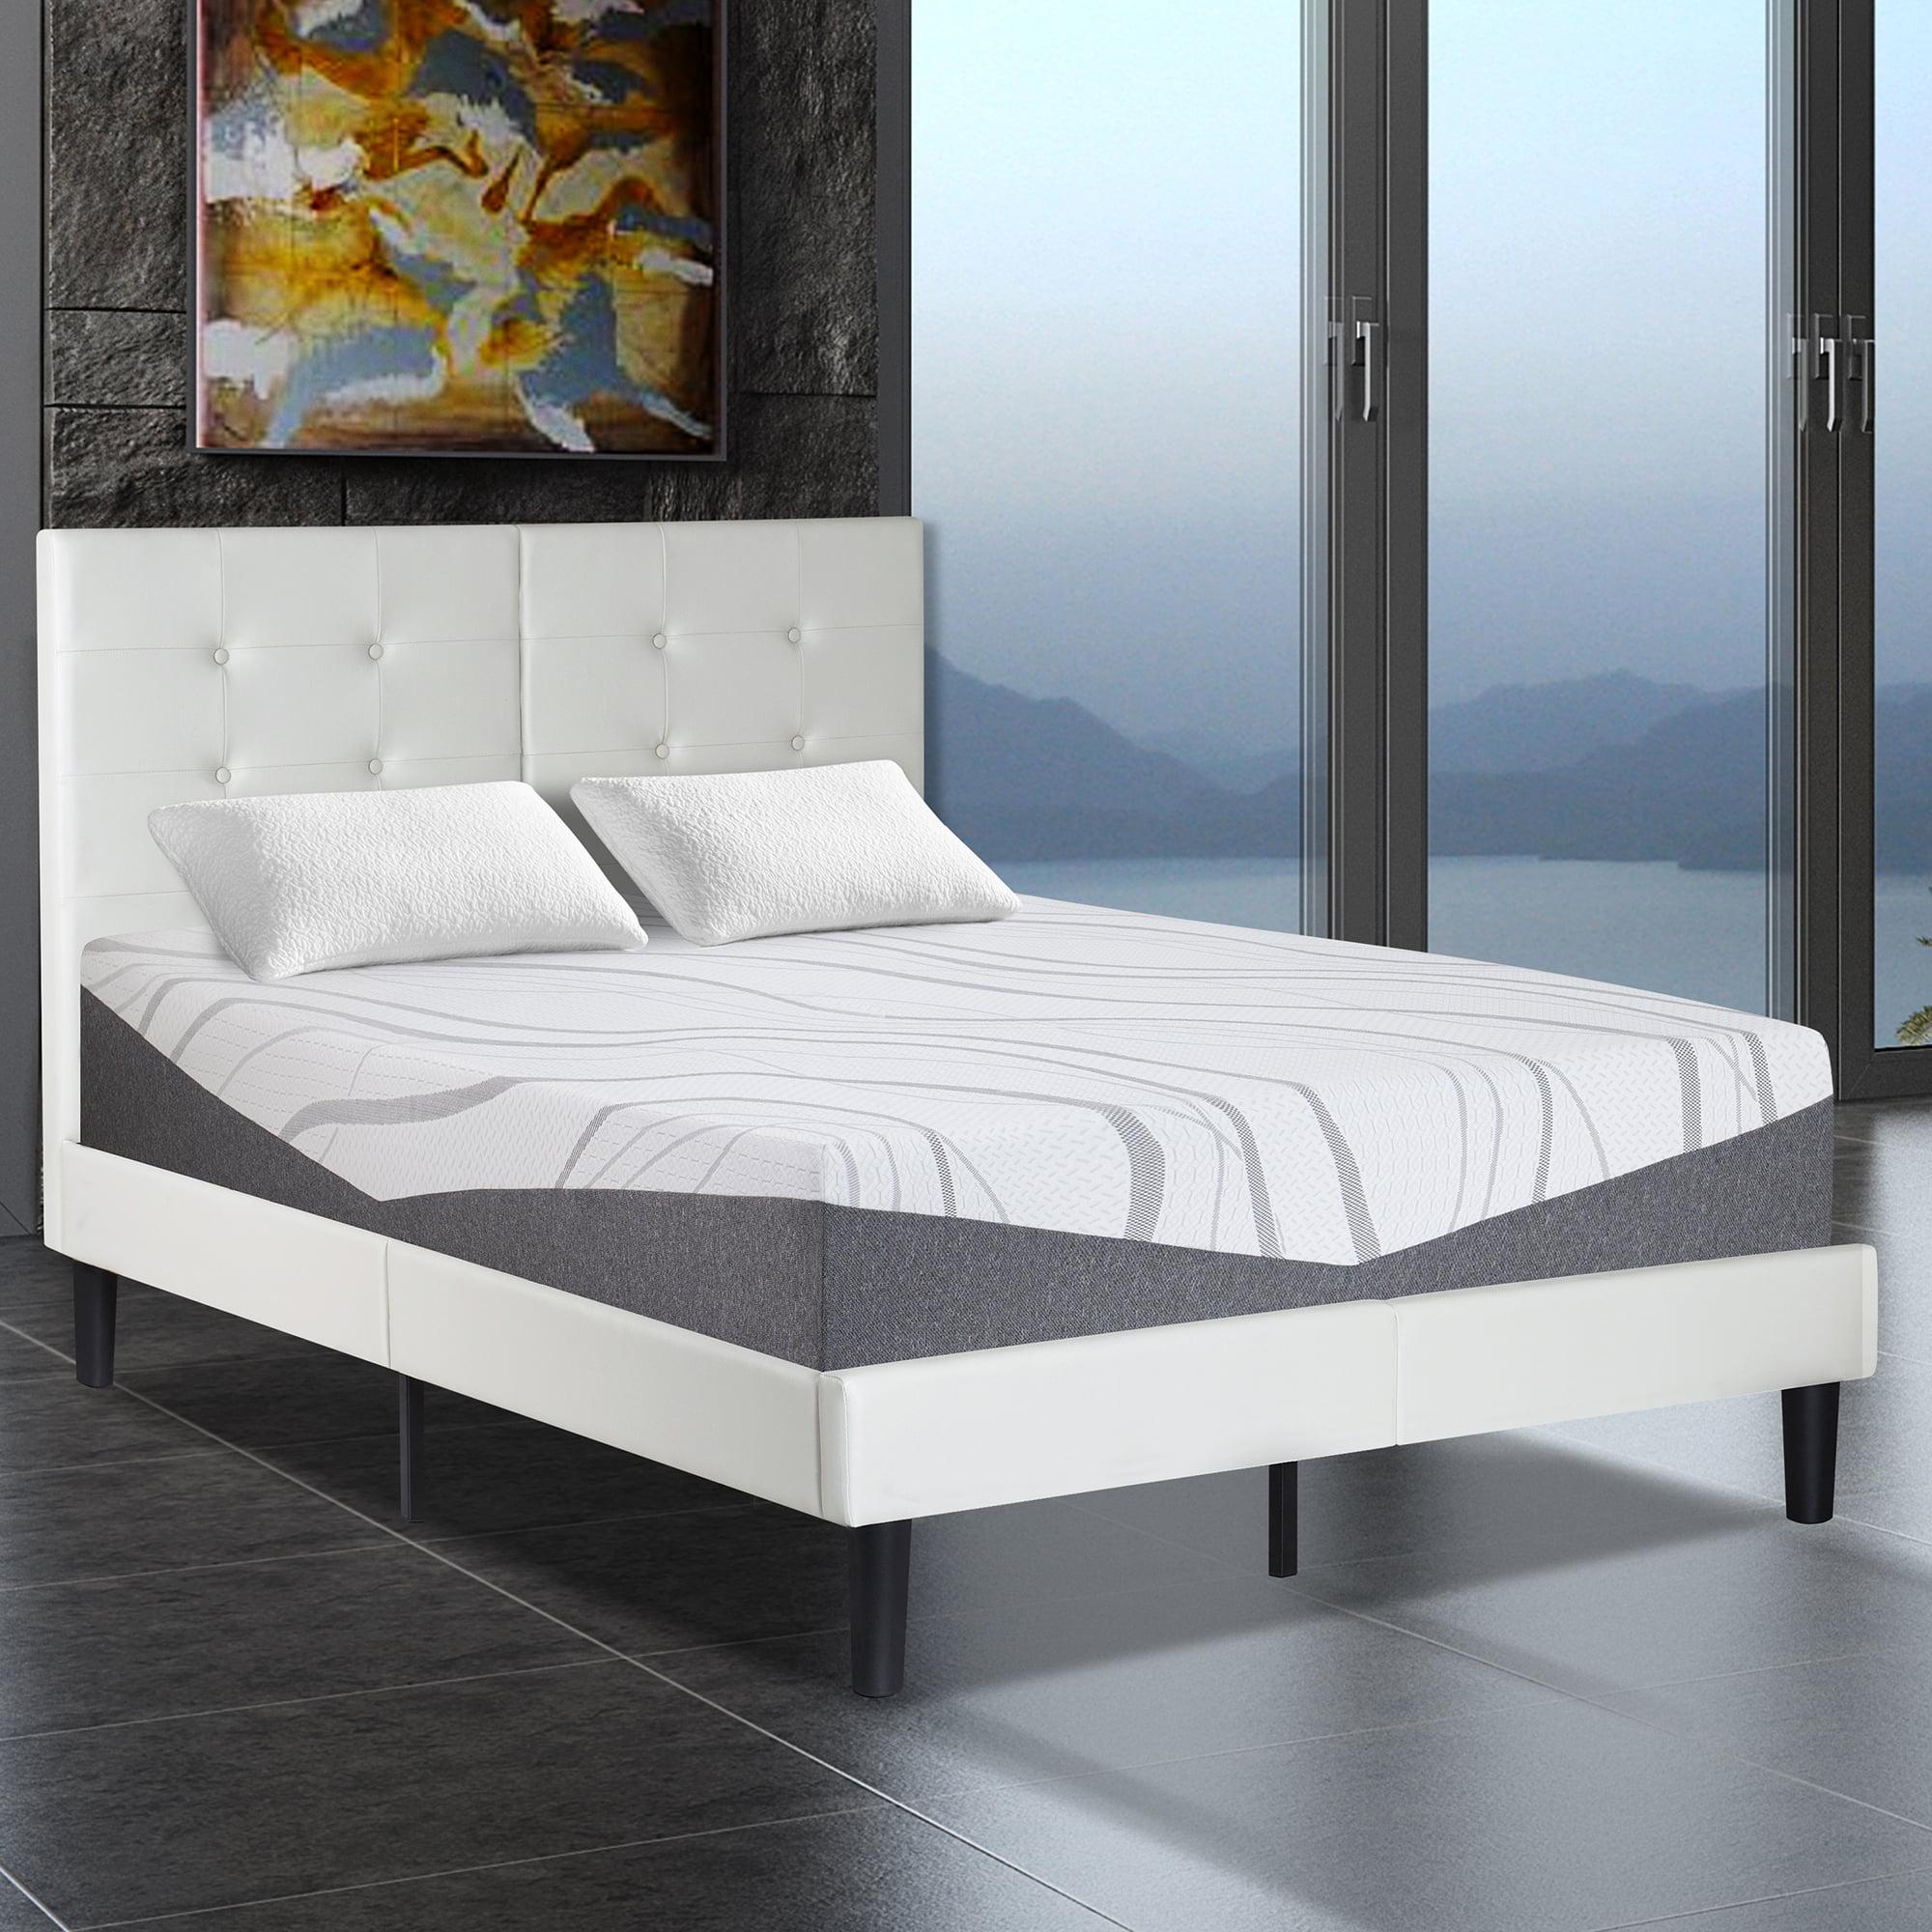 Sleeplace 10 inch Ultra Comfort Multi Layer Memory Foam Mattress (TWIN)